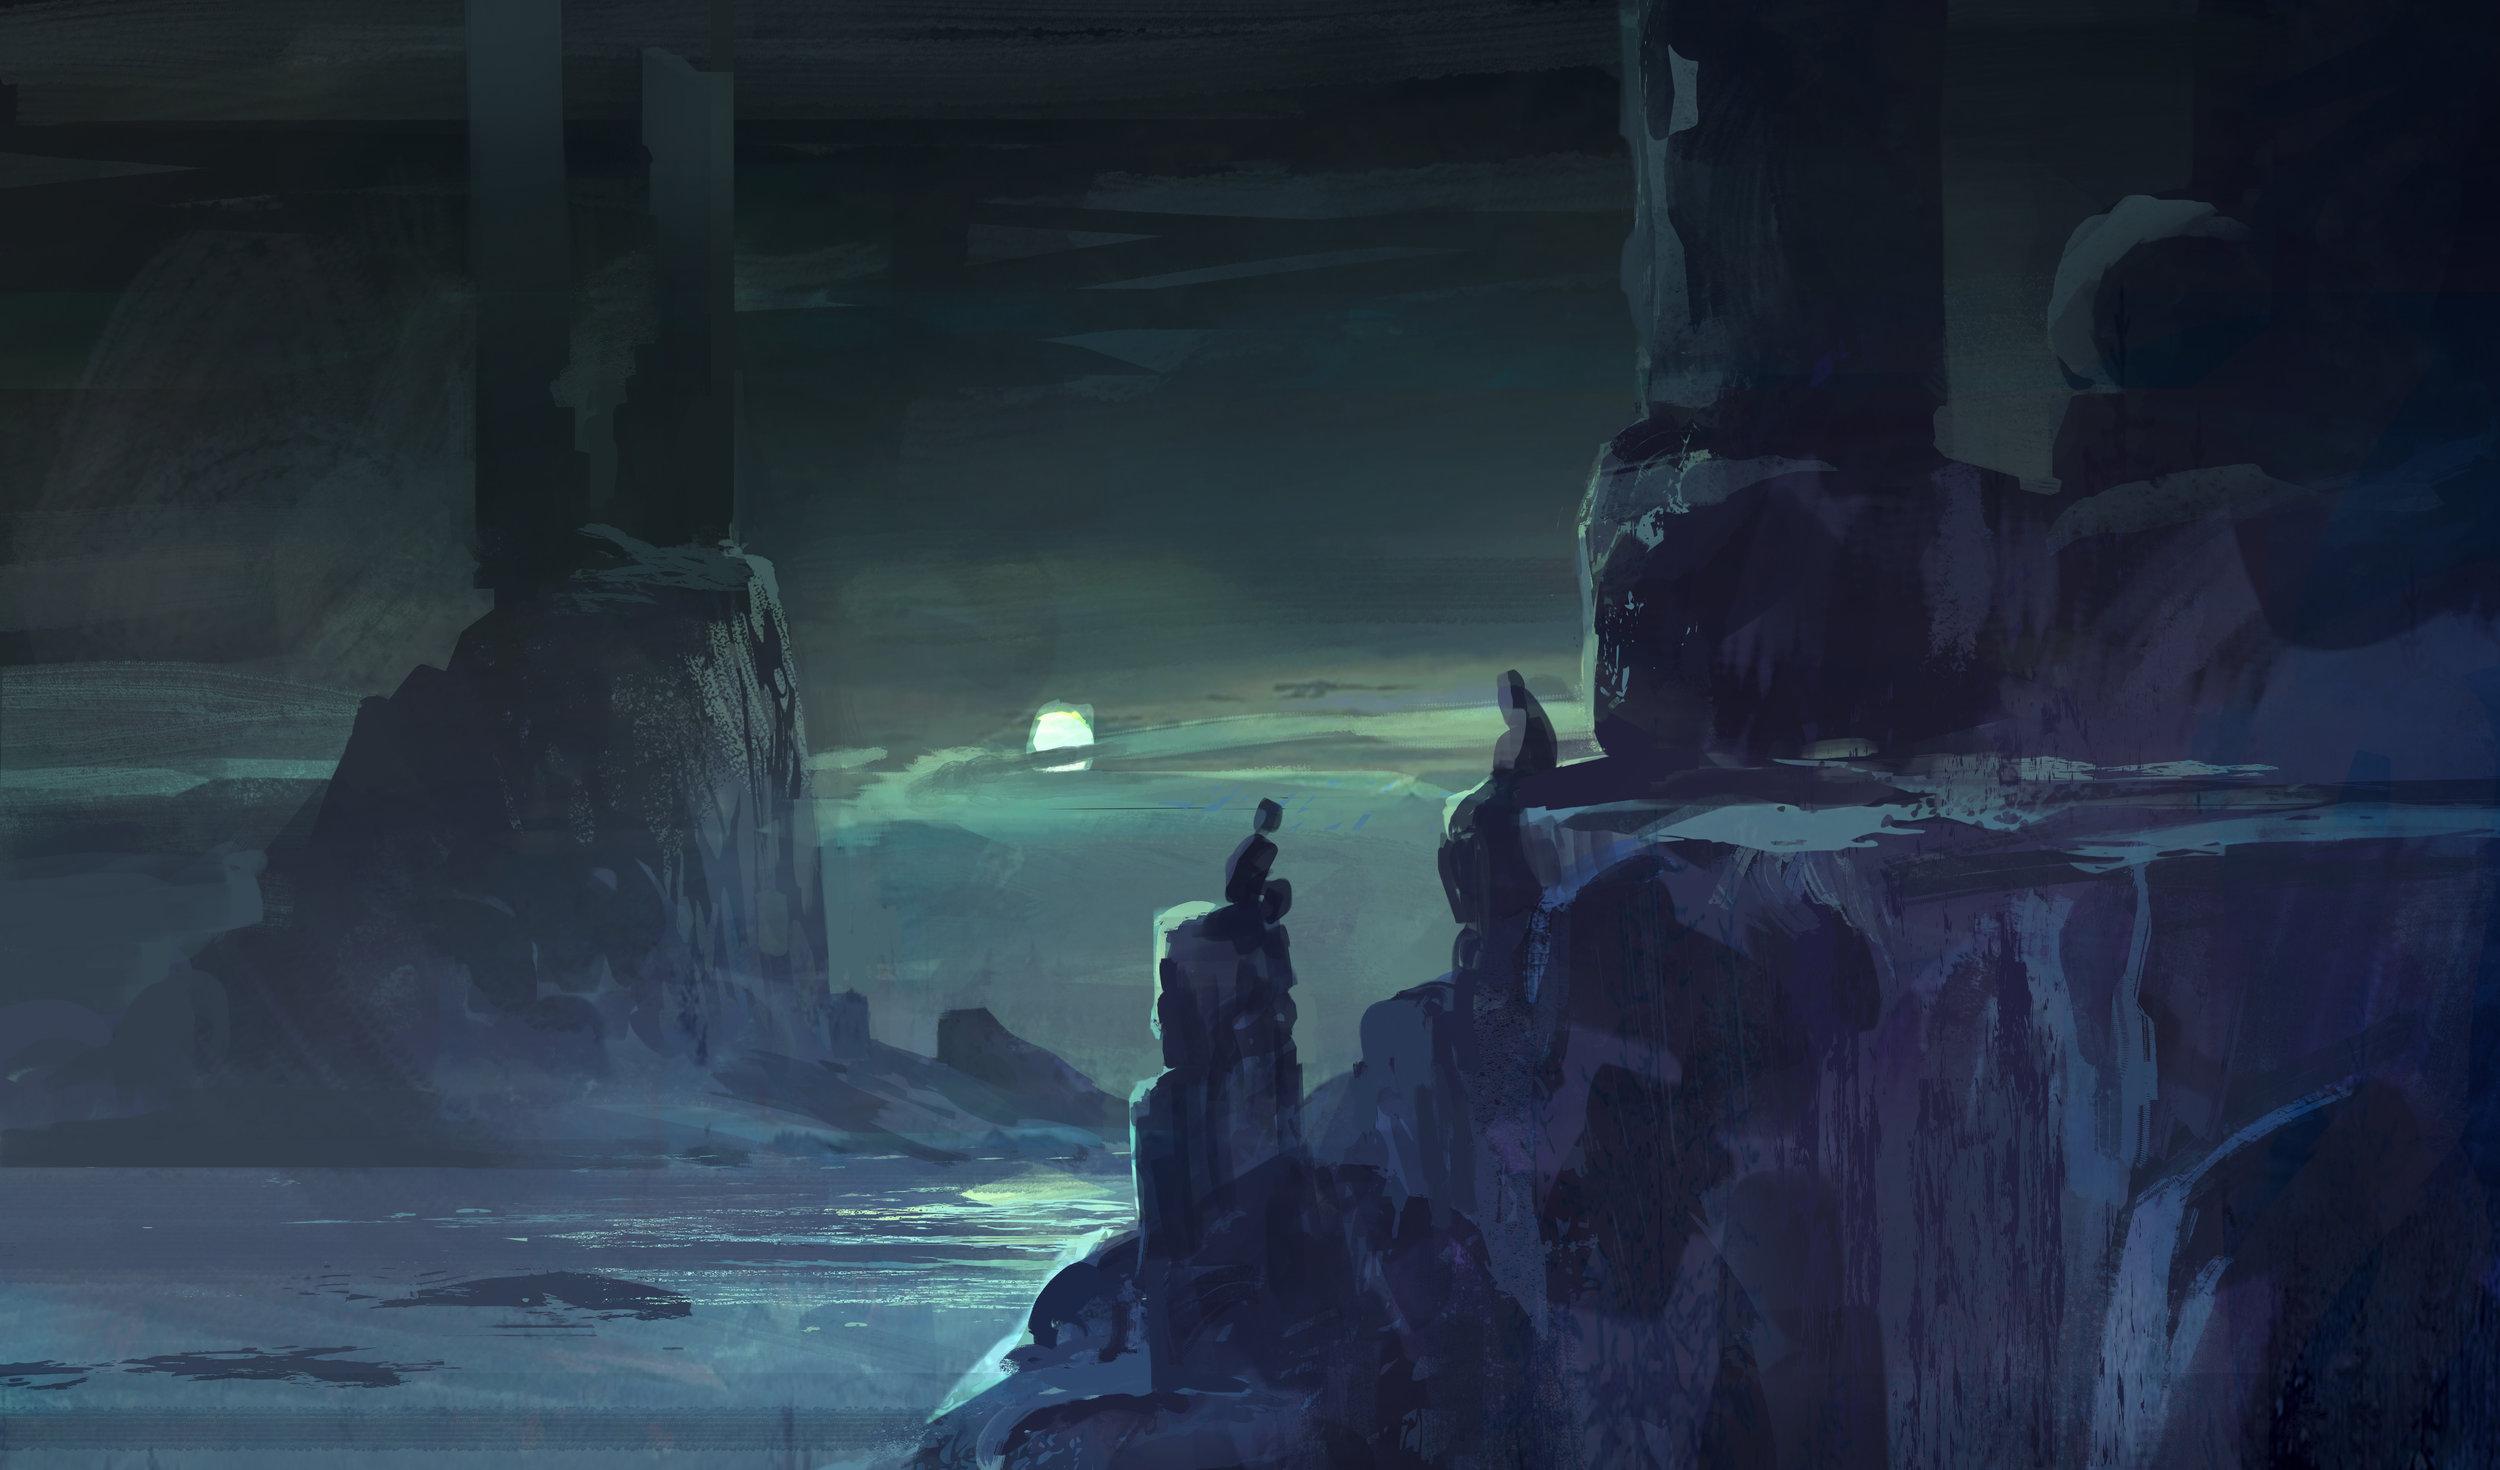 moonsea_5-11-16.jpg